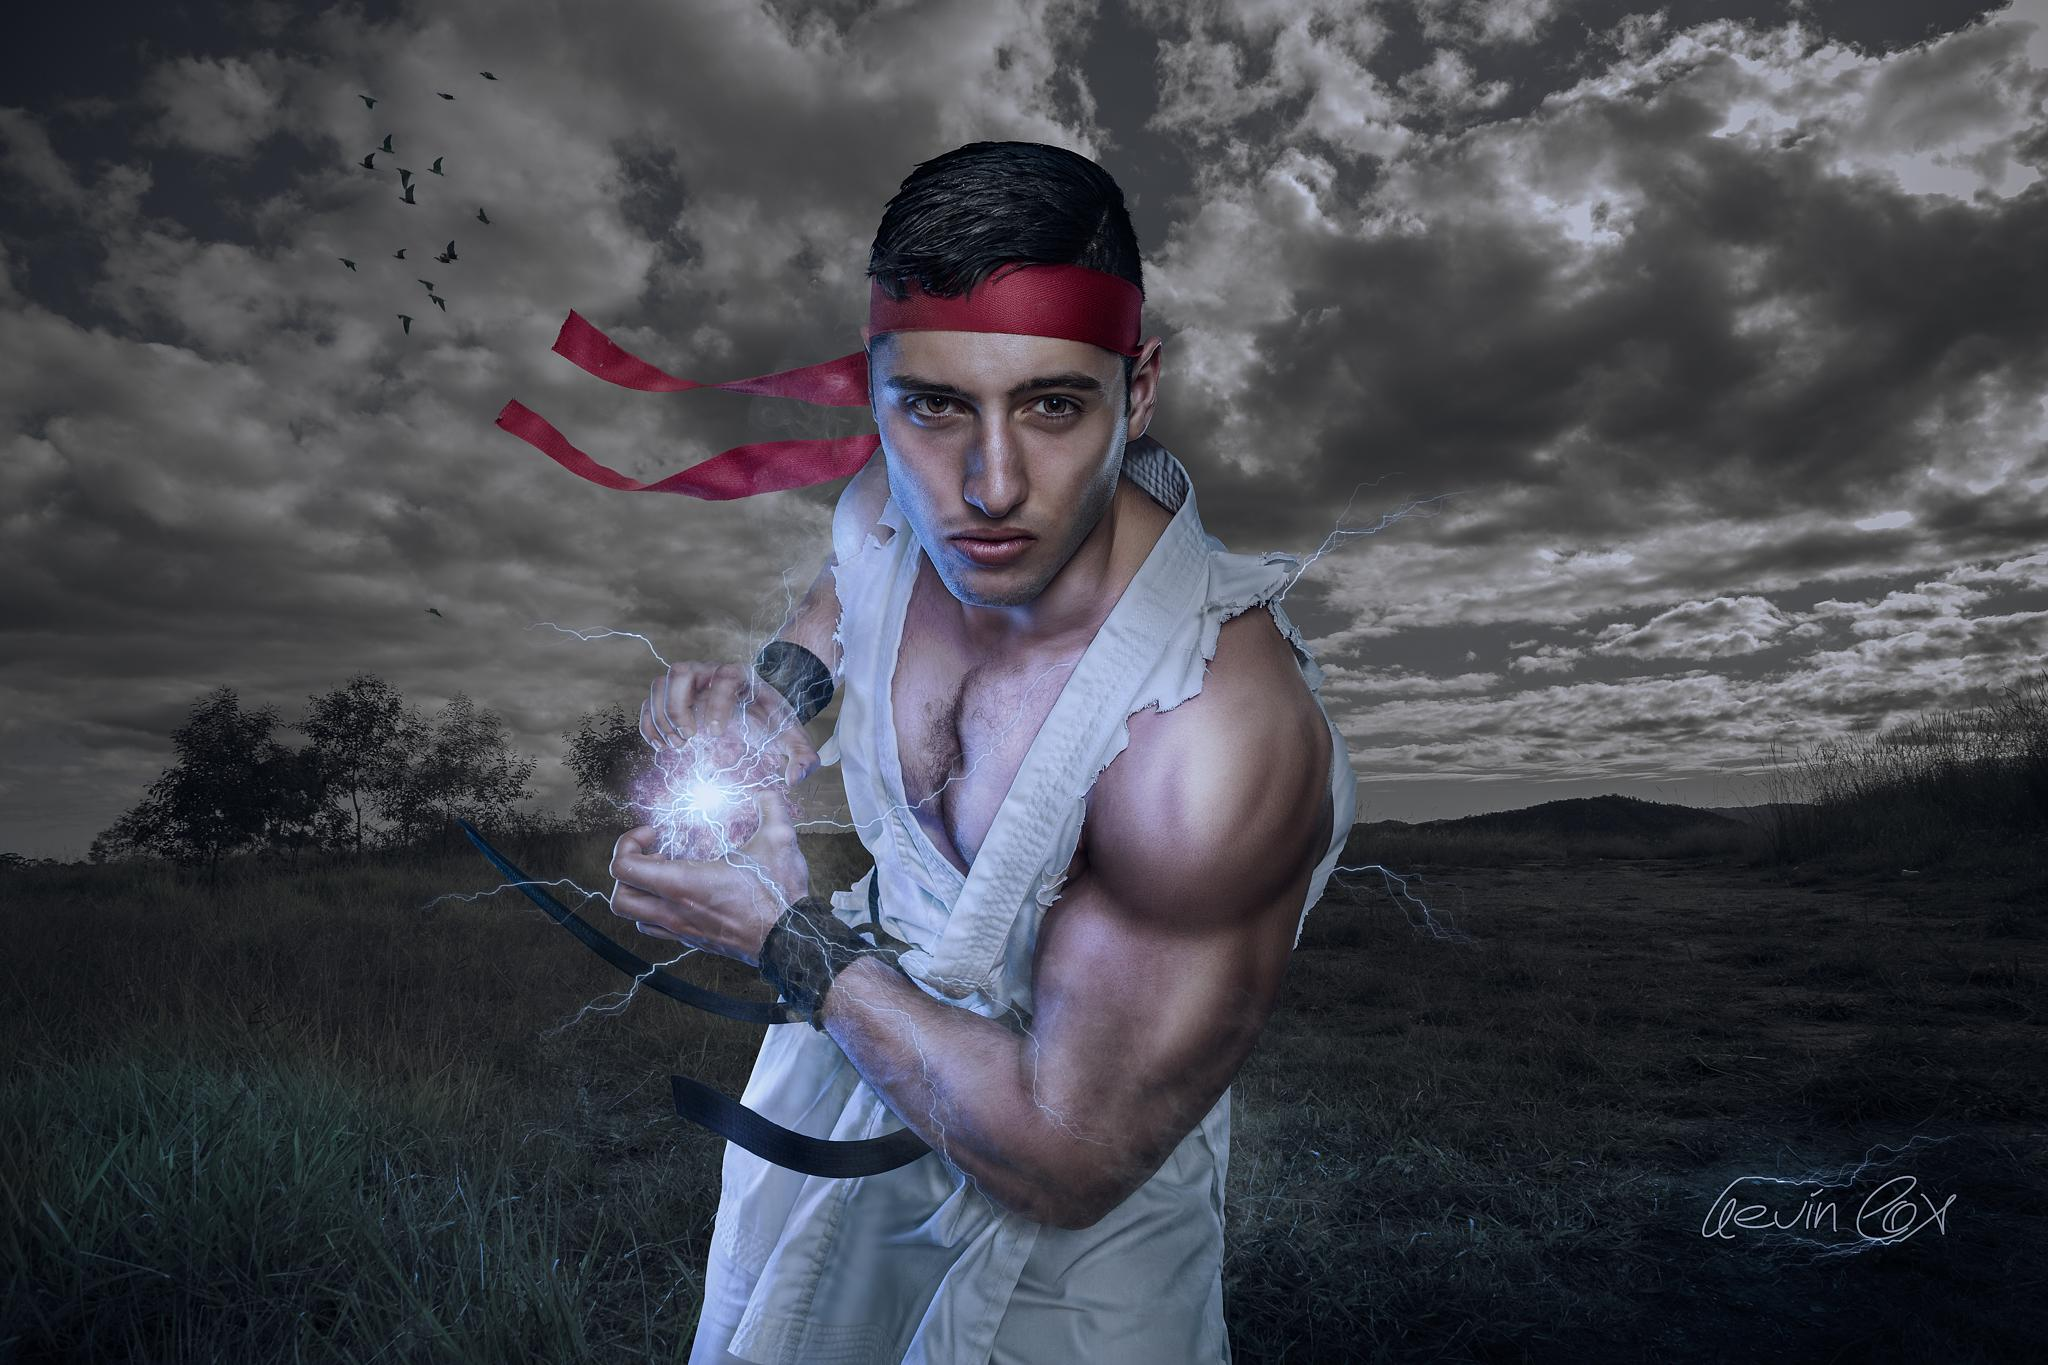 Ryu by Kevin Cox